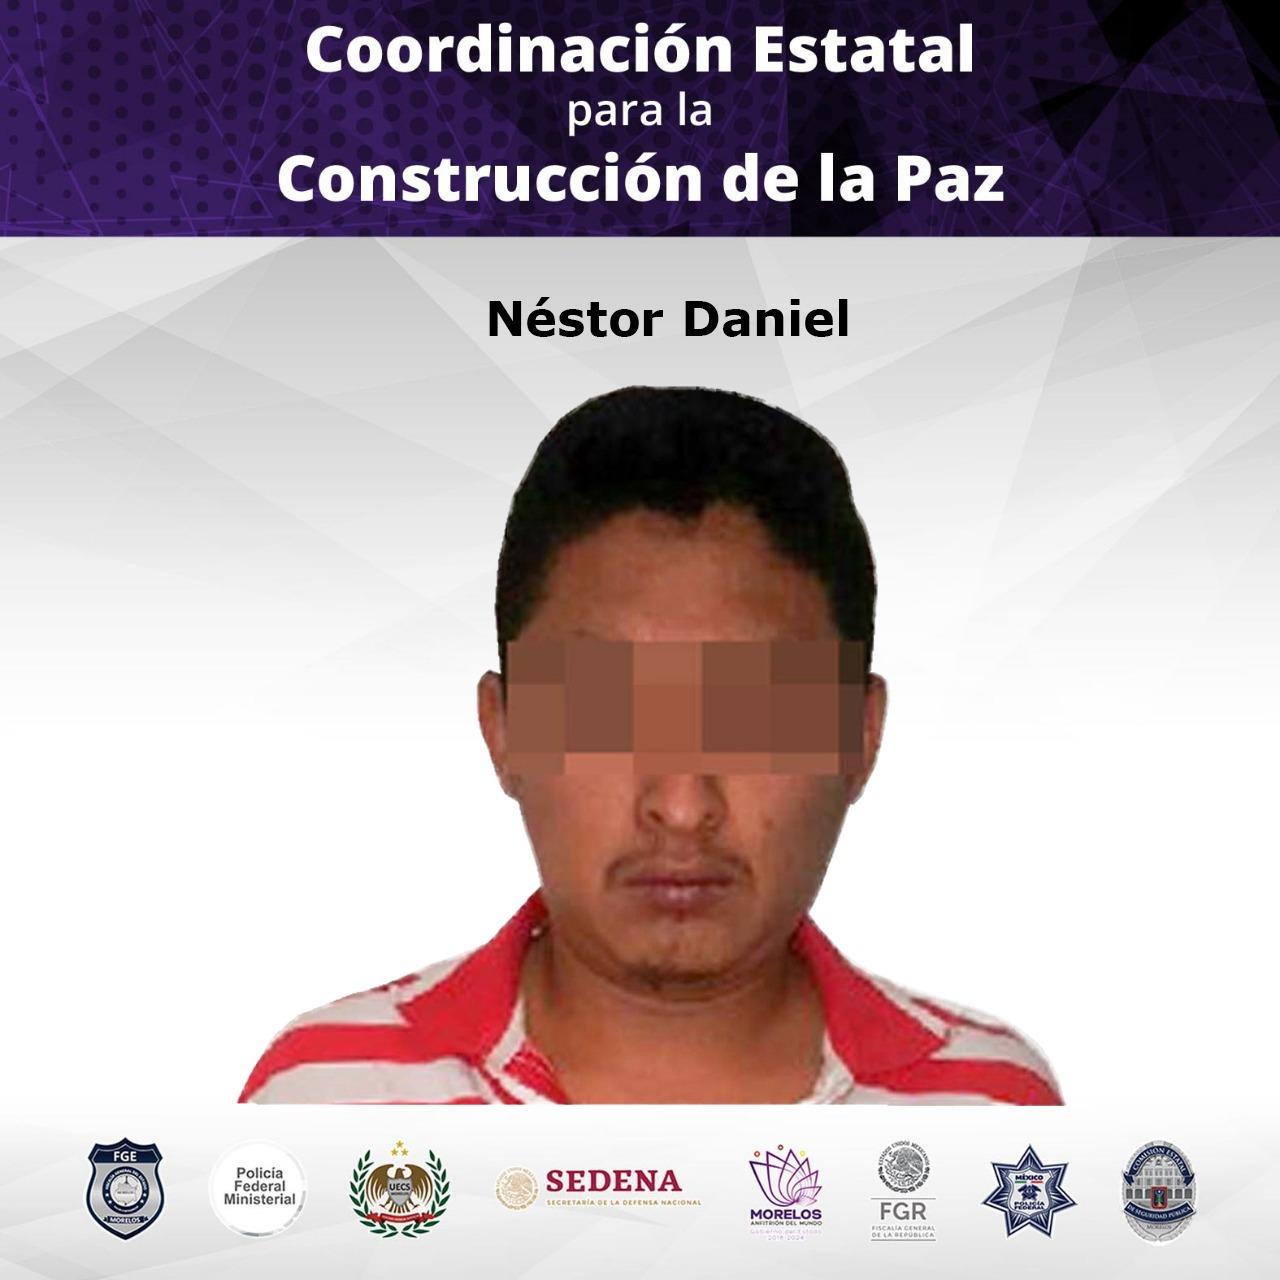 Nestor Daniel N